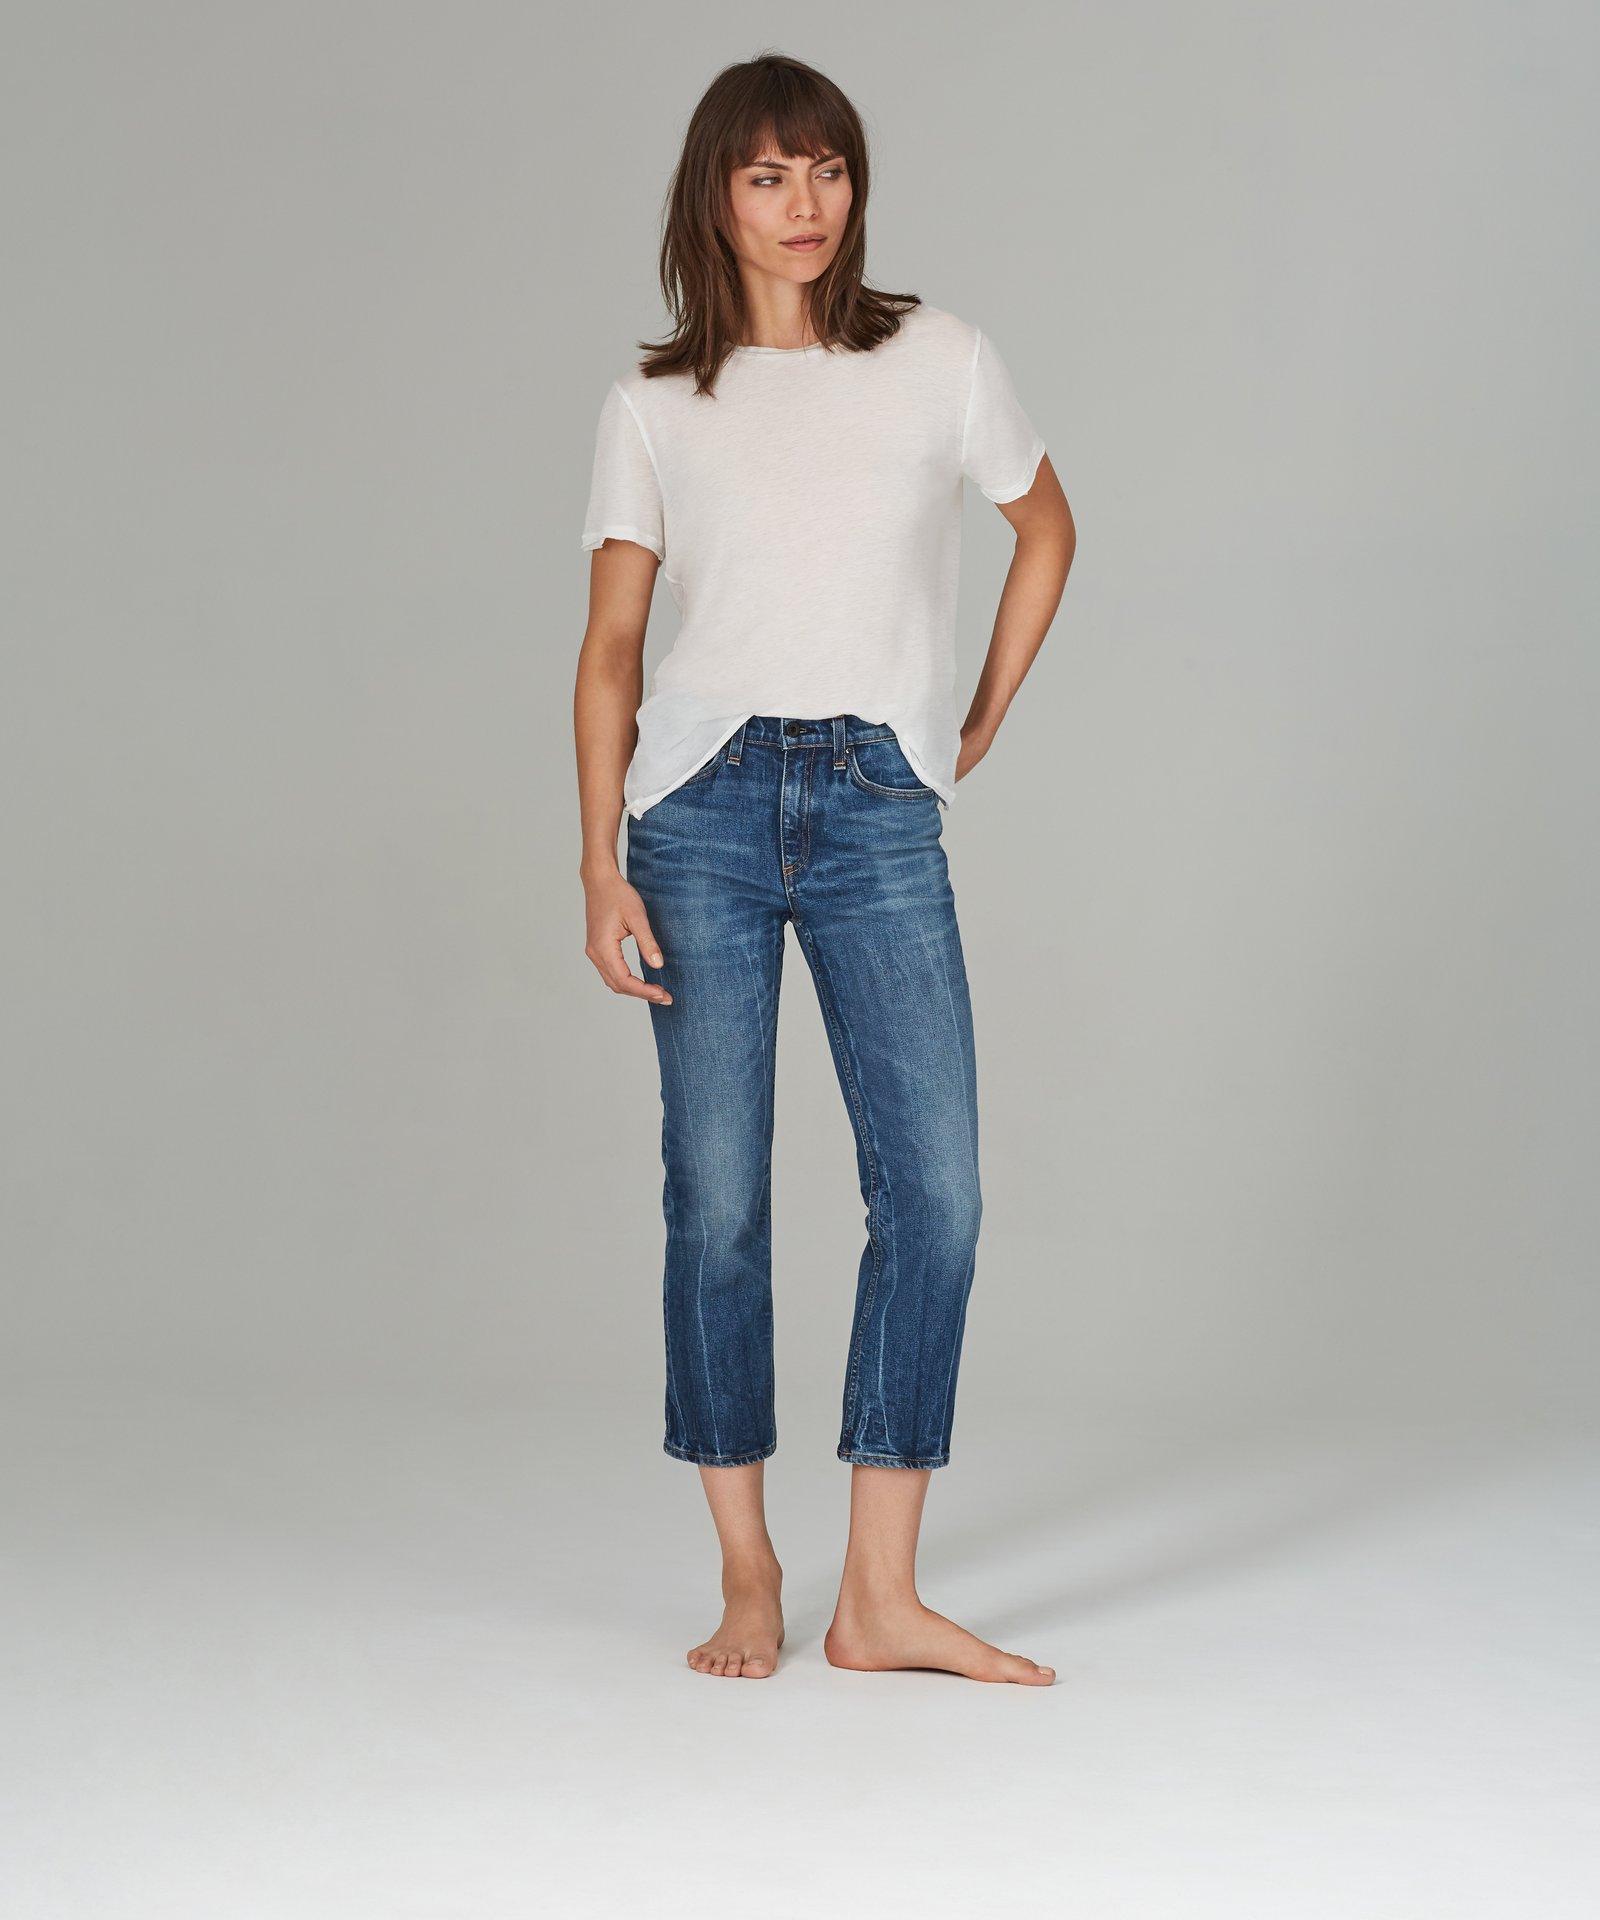 slim jeans, straight leg jeans, medium blue, marbled denim, cropped jeans, askk ny